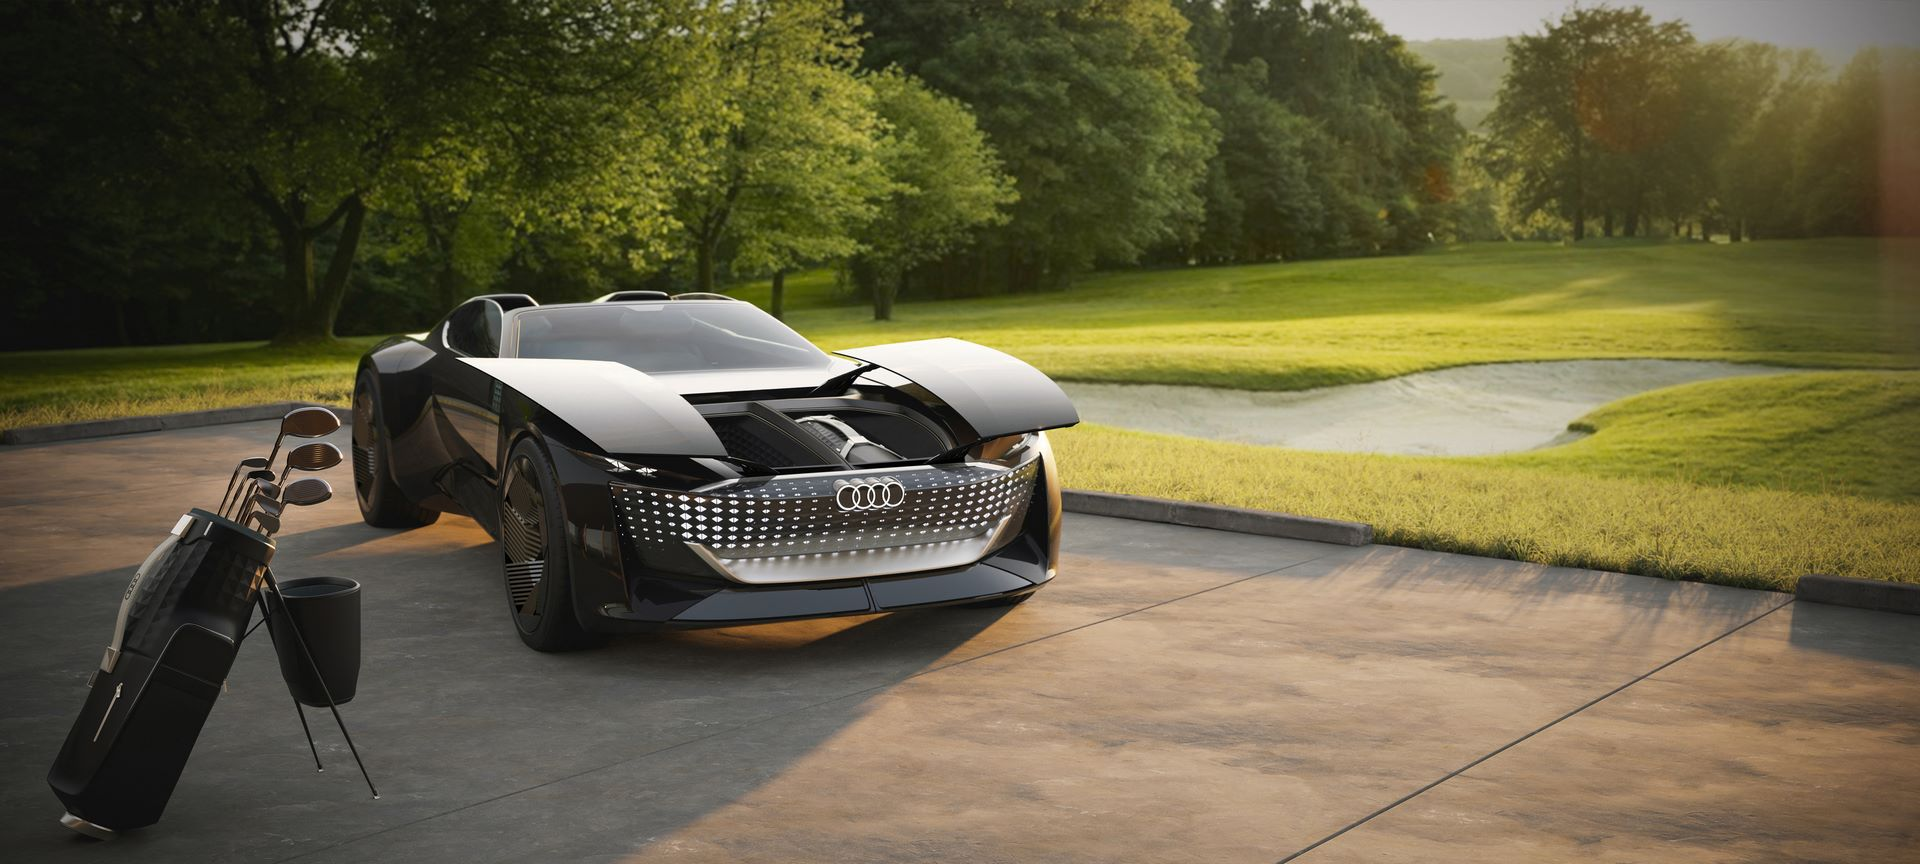 Audi-Skysphere-Concept-29